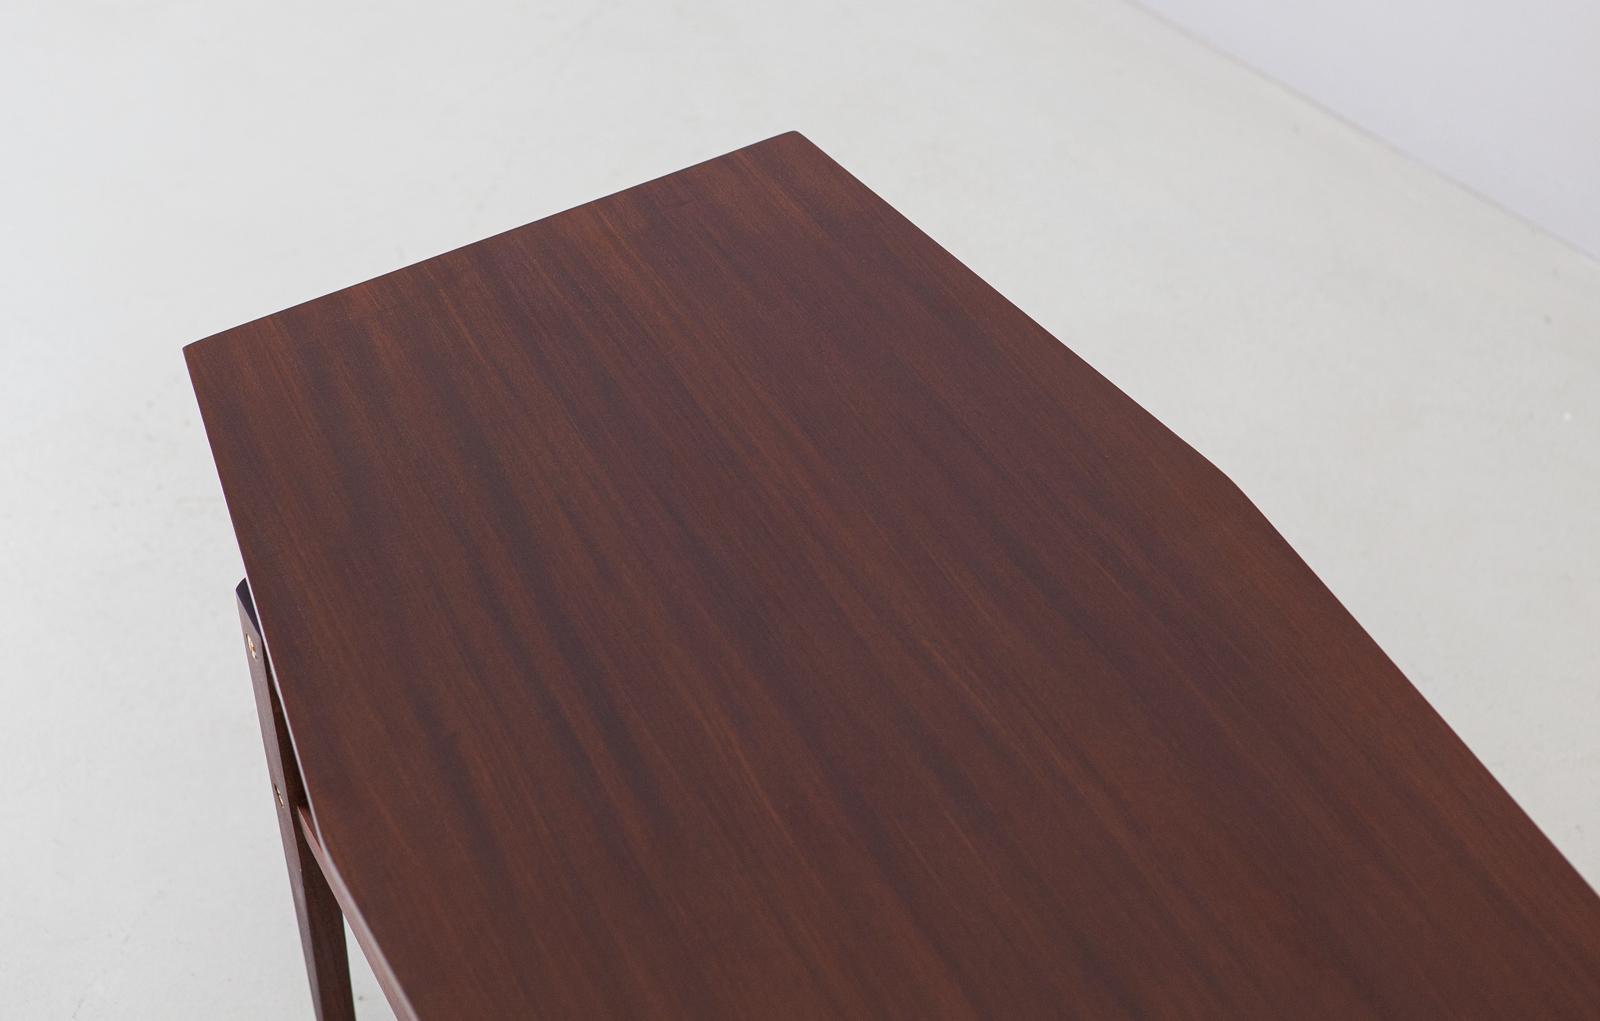 1950s-italian-modern-coffee-table-8-t90